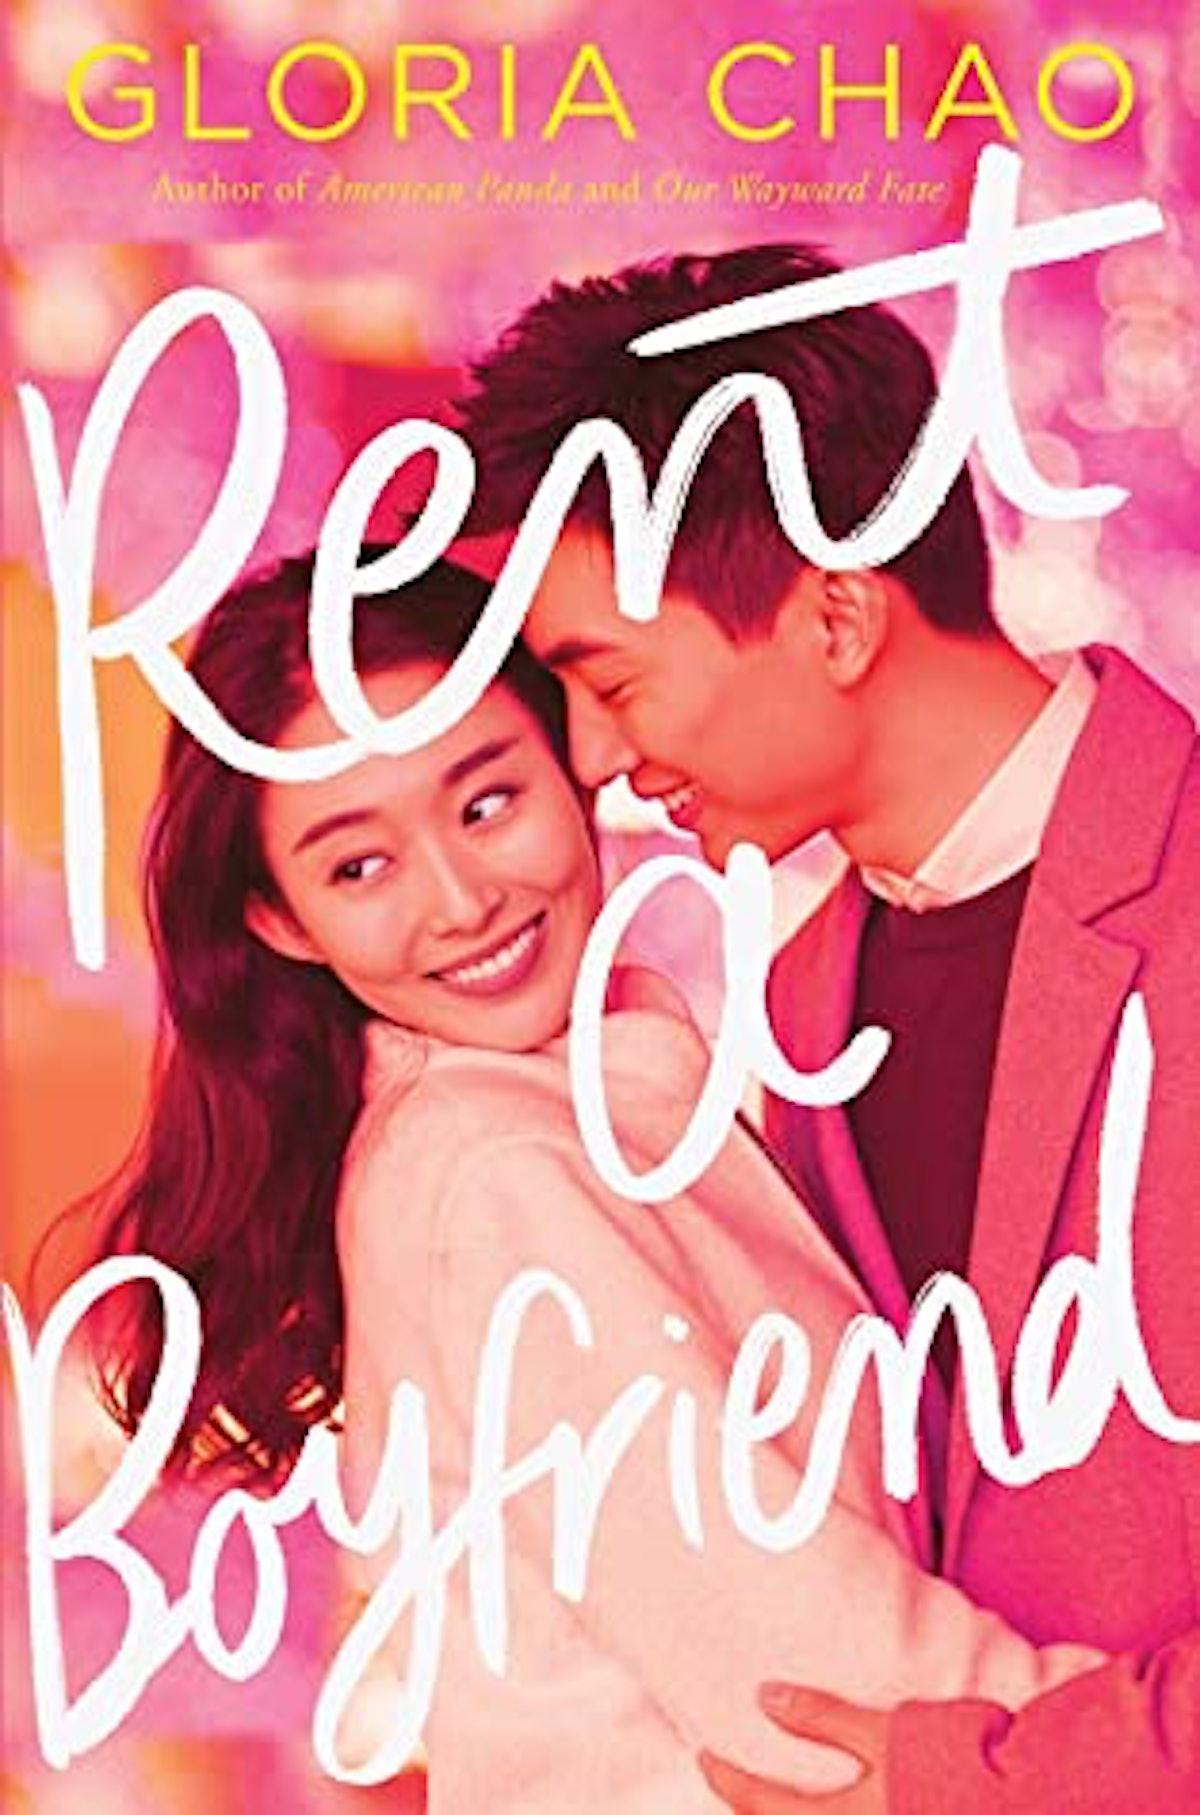 'Rent a Boyfriend' by Gloria Chao